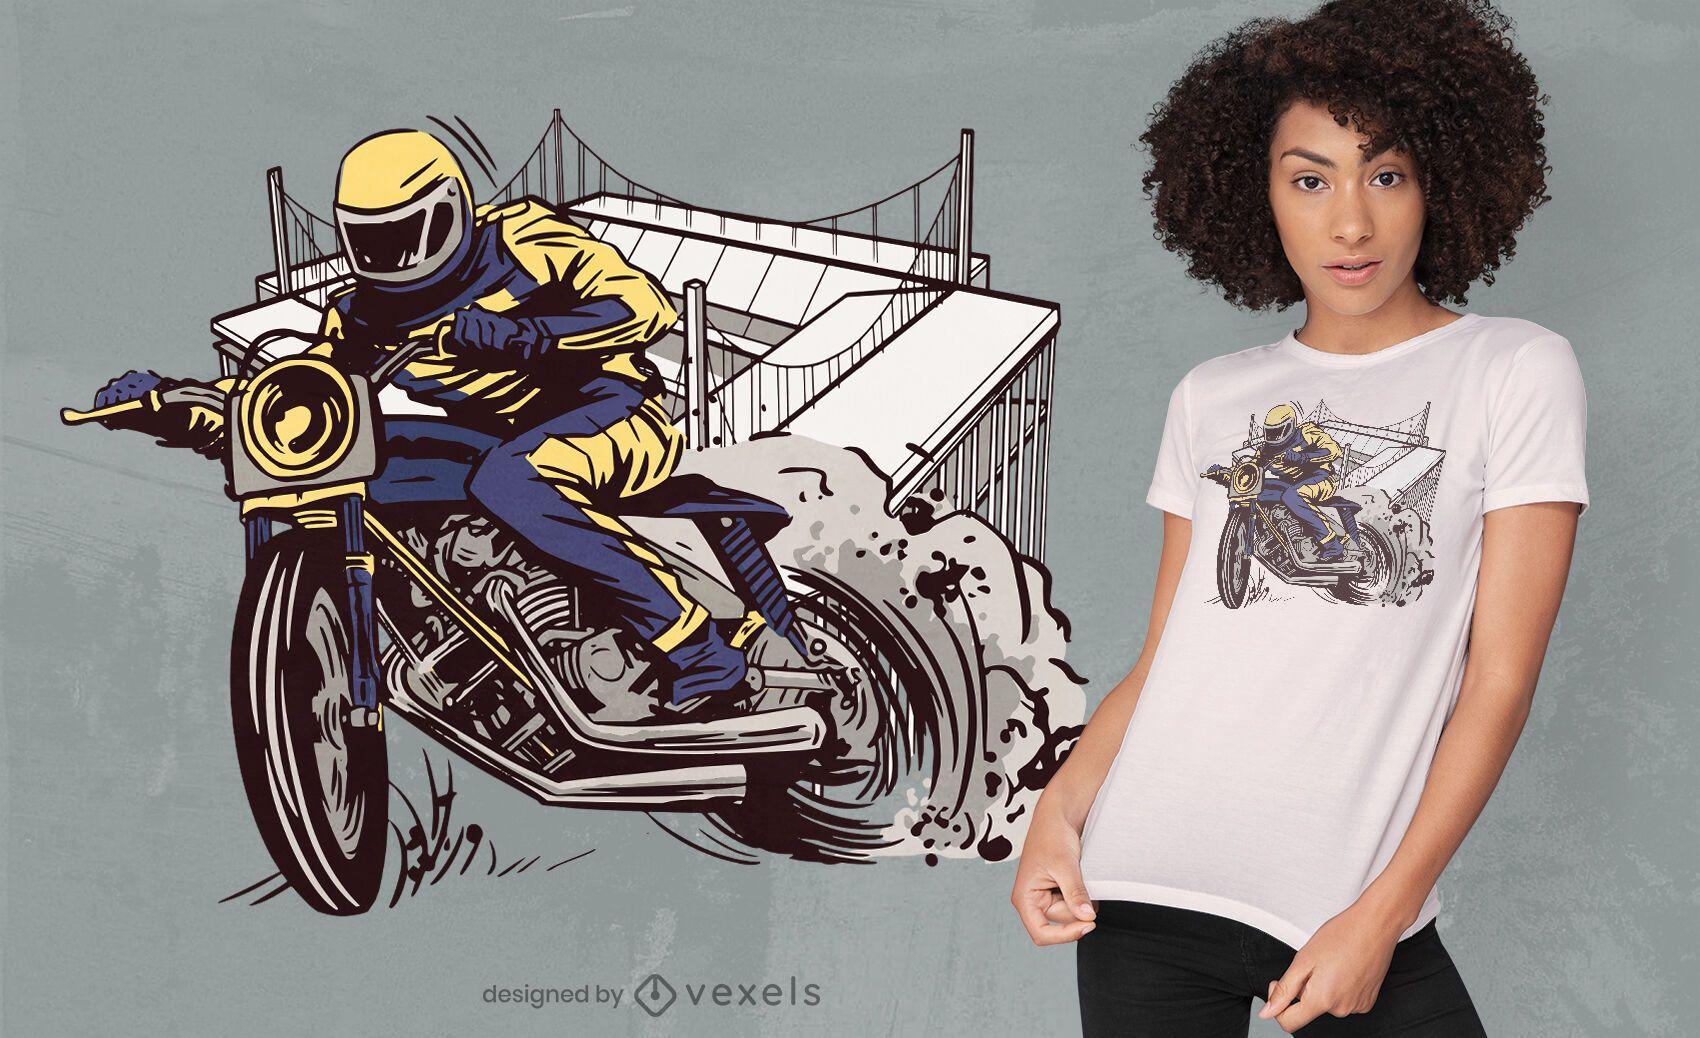 Speeding motorcycle riding suit t-shirt design